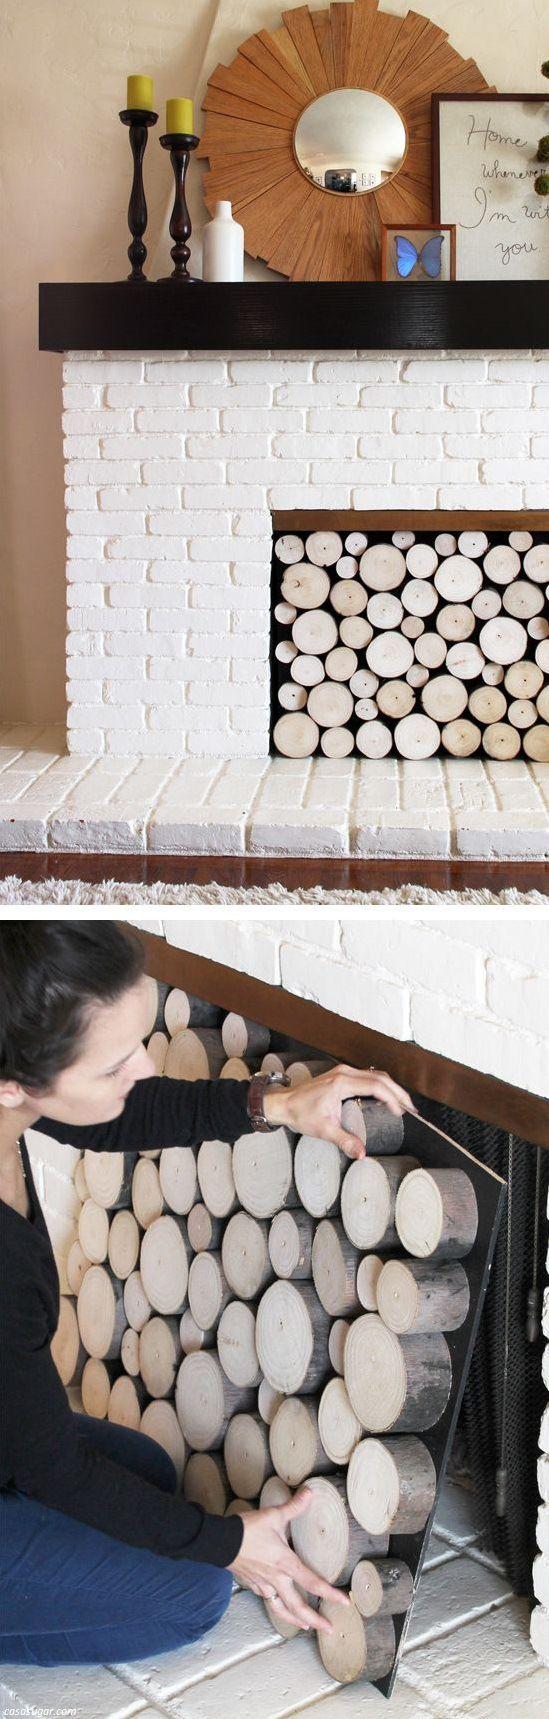 Decorative Fireplace Ideas best 25+ decorative fireplace screens ideas on pinterest